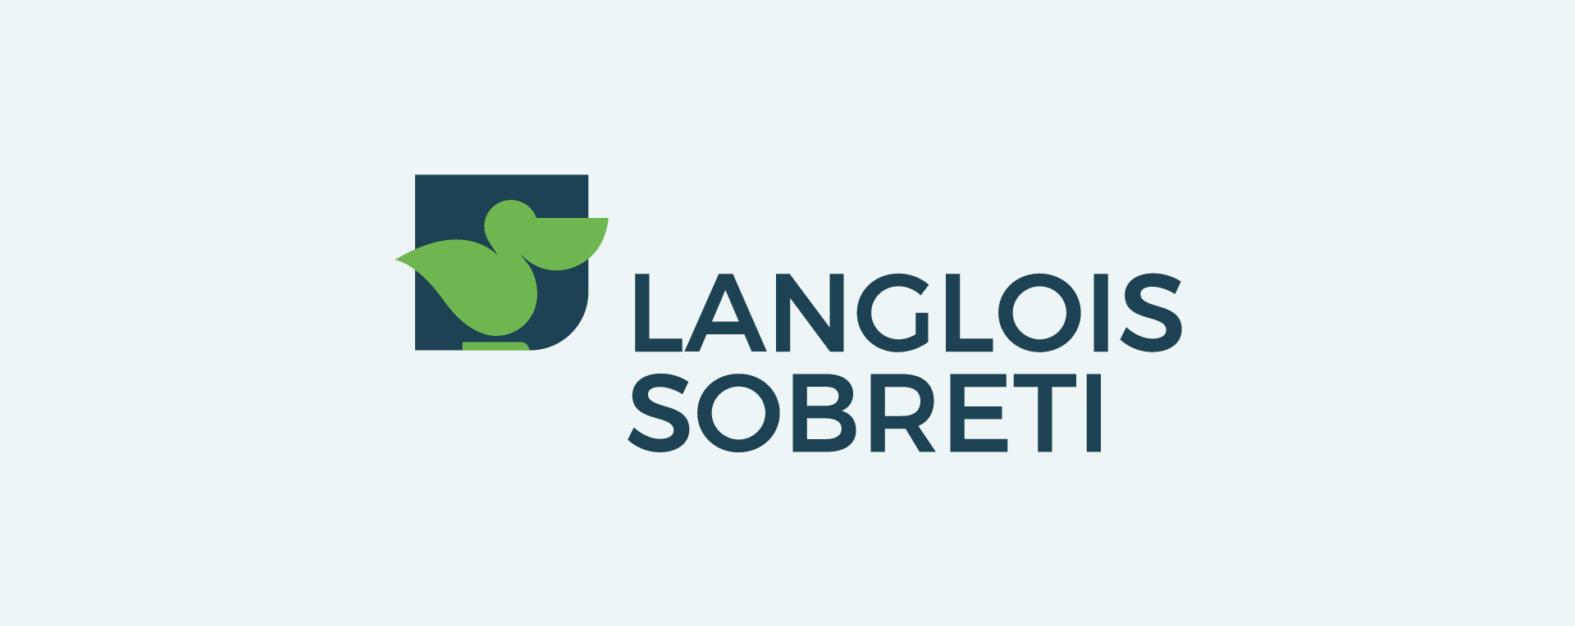 Landeau création Langlois Sobreti logotype